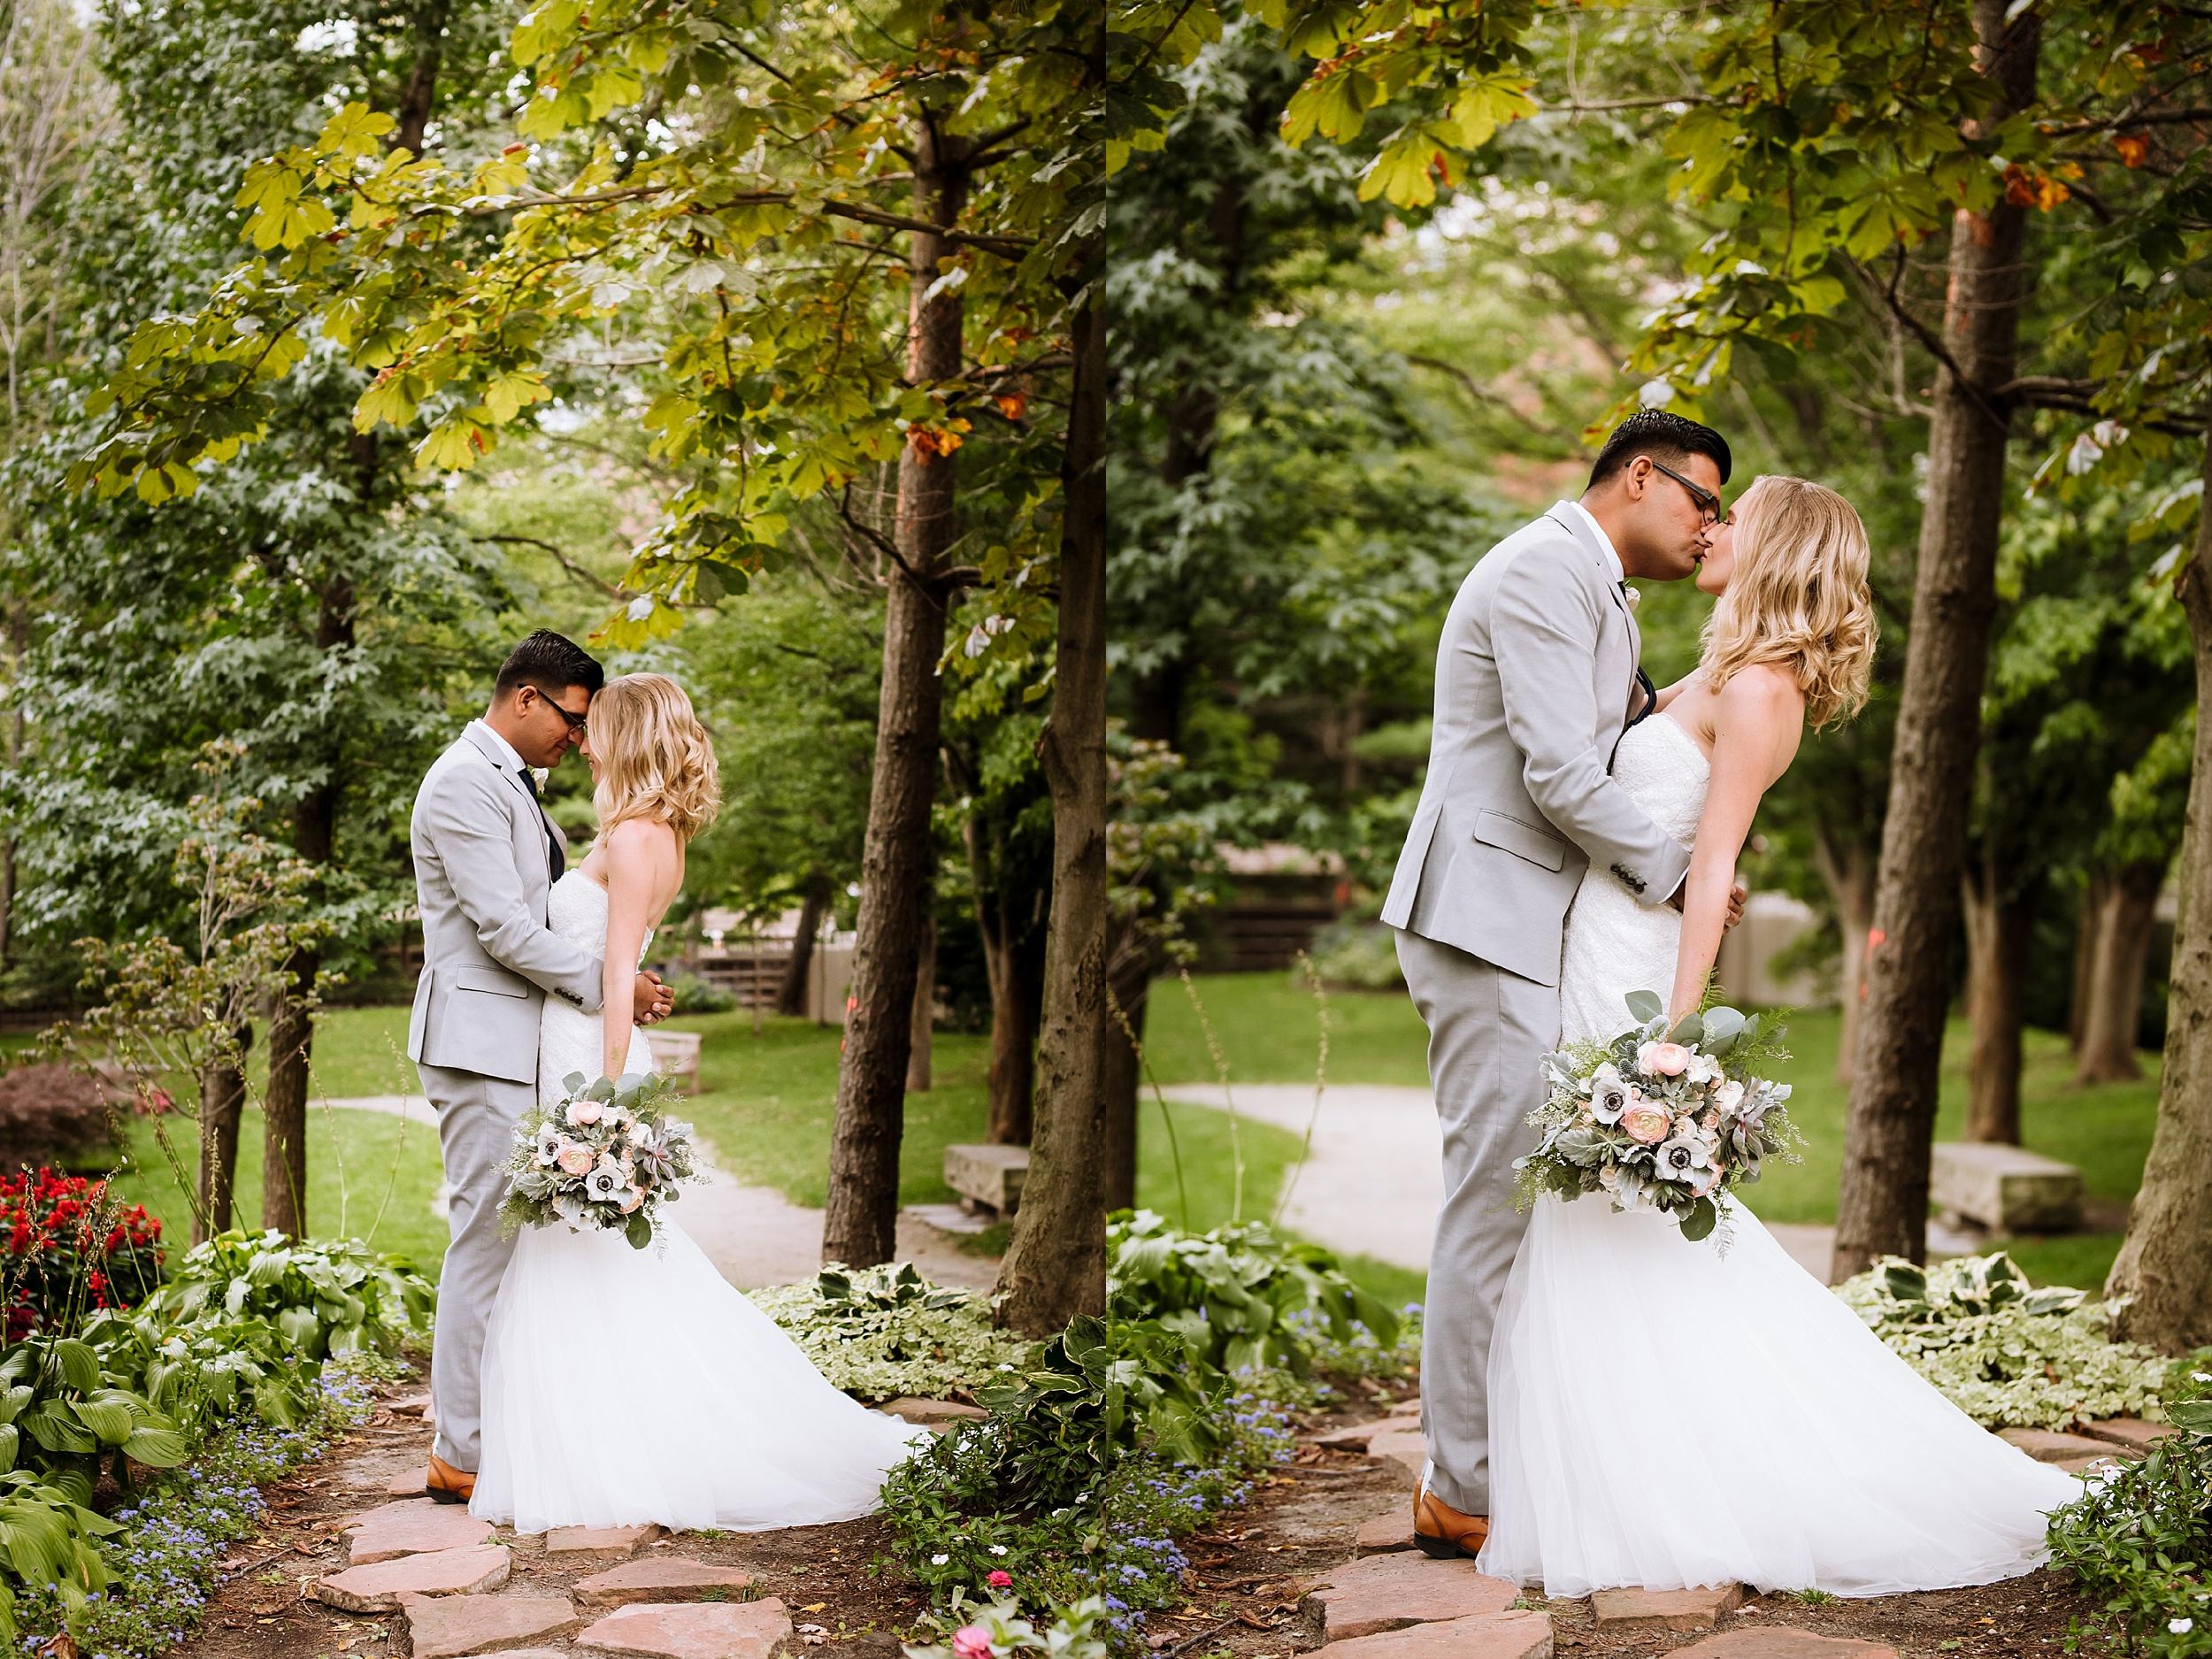 Kariya_Park_Wedding_Shoot_Toronto_Photographer_0037.jpg